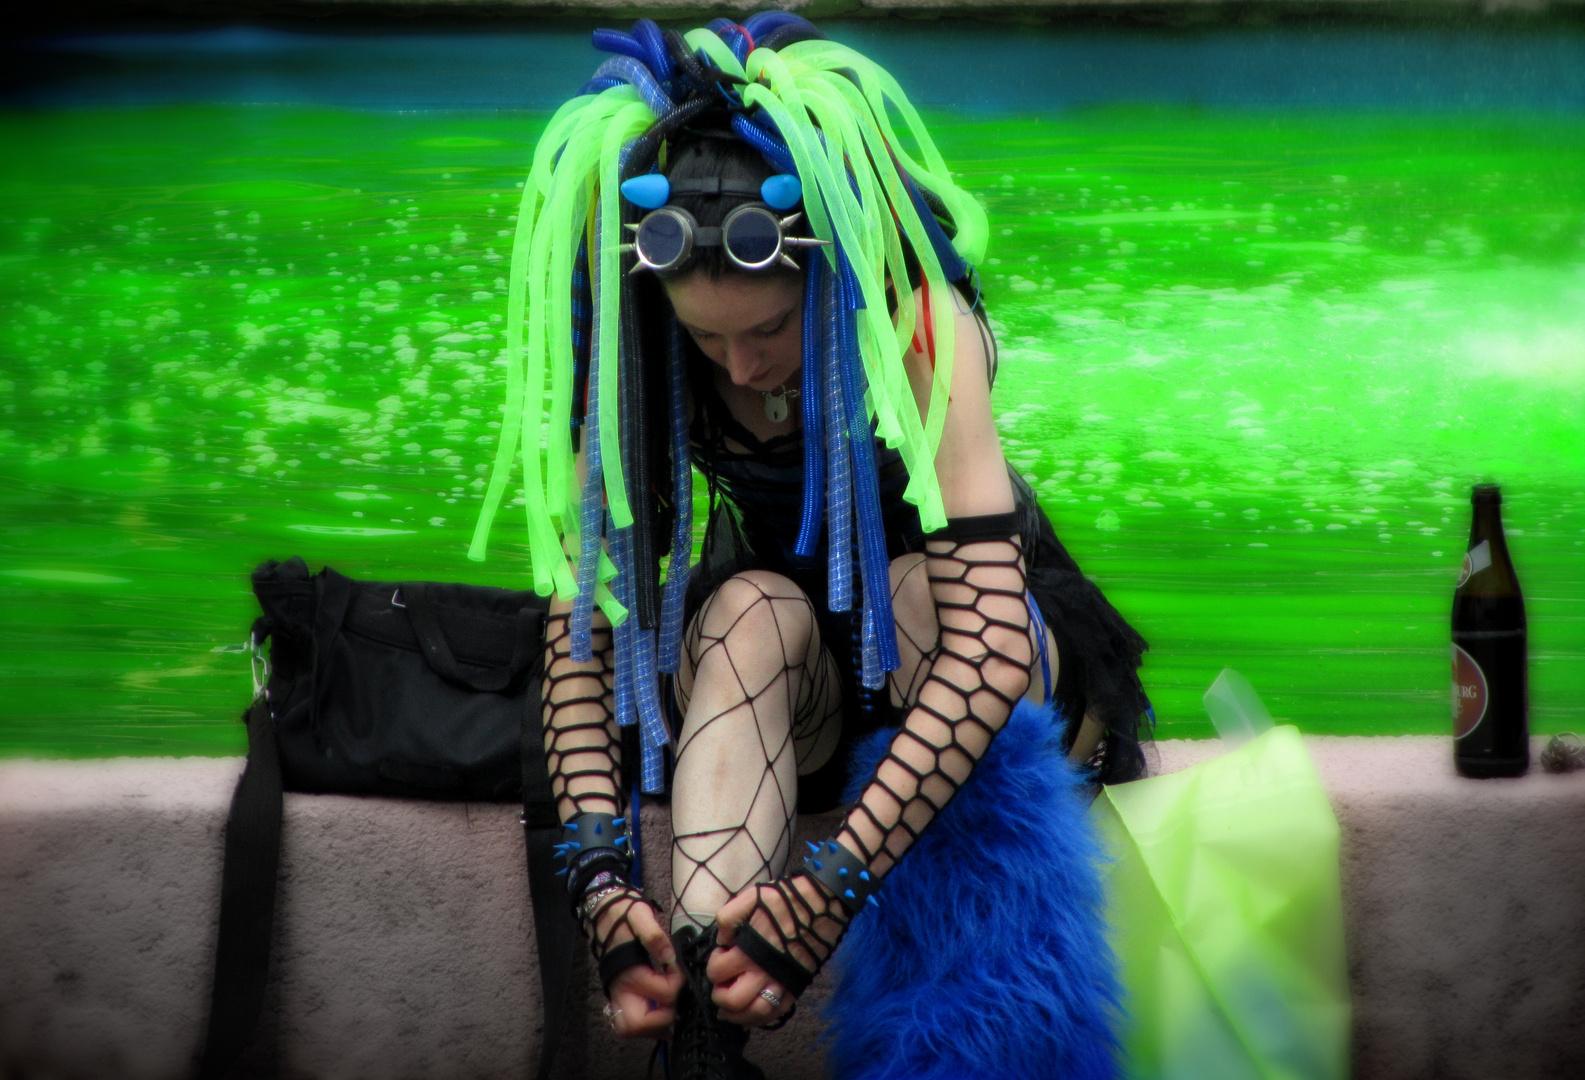 Green Cyber